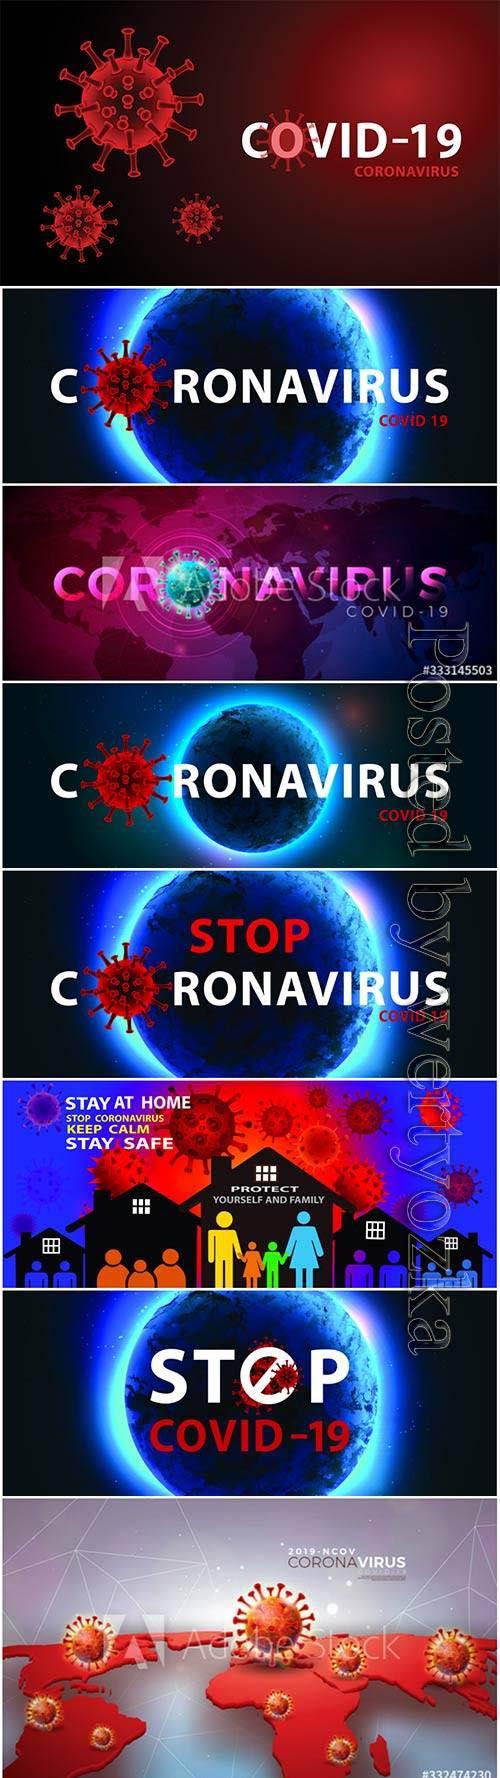 COVID 19, Coranavirus vector illustration sets 28